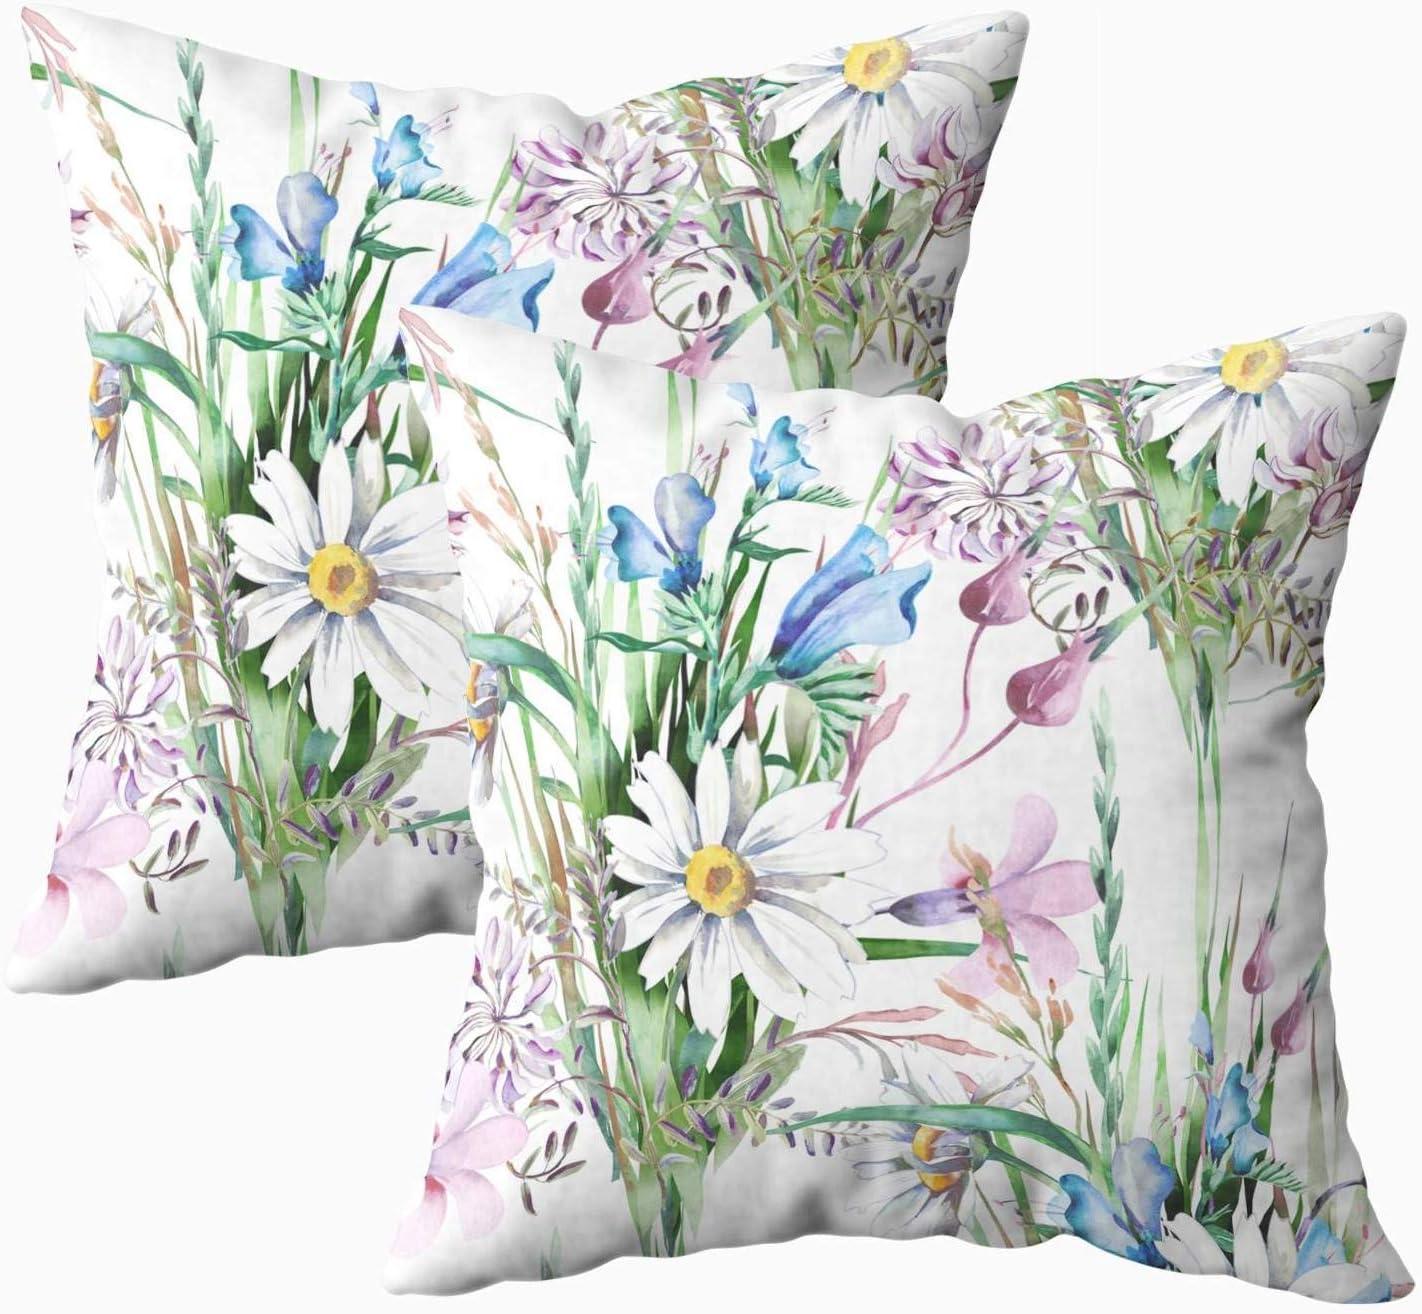 hfdff Sleepyhead Pillow Cover, Zippered